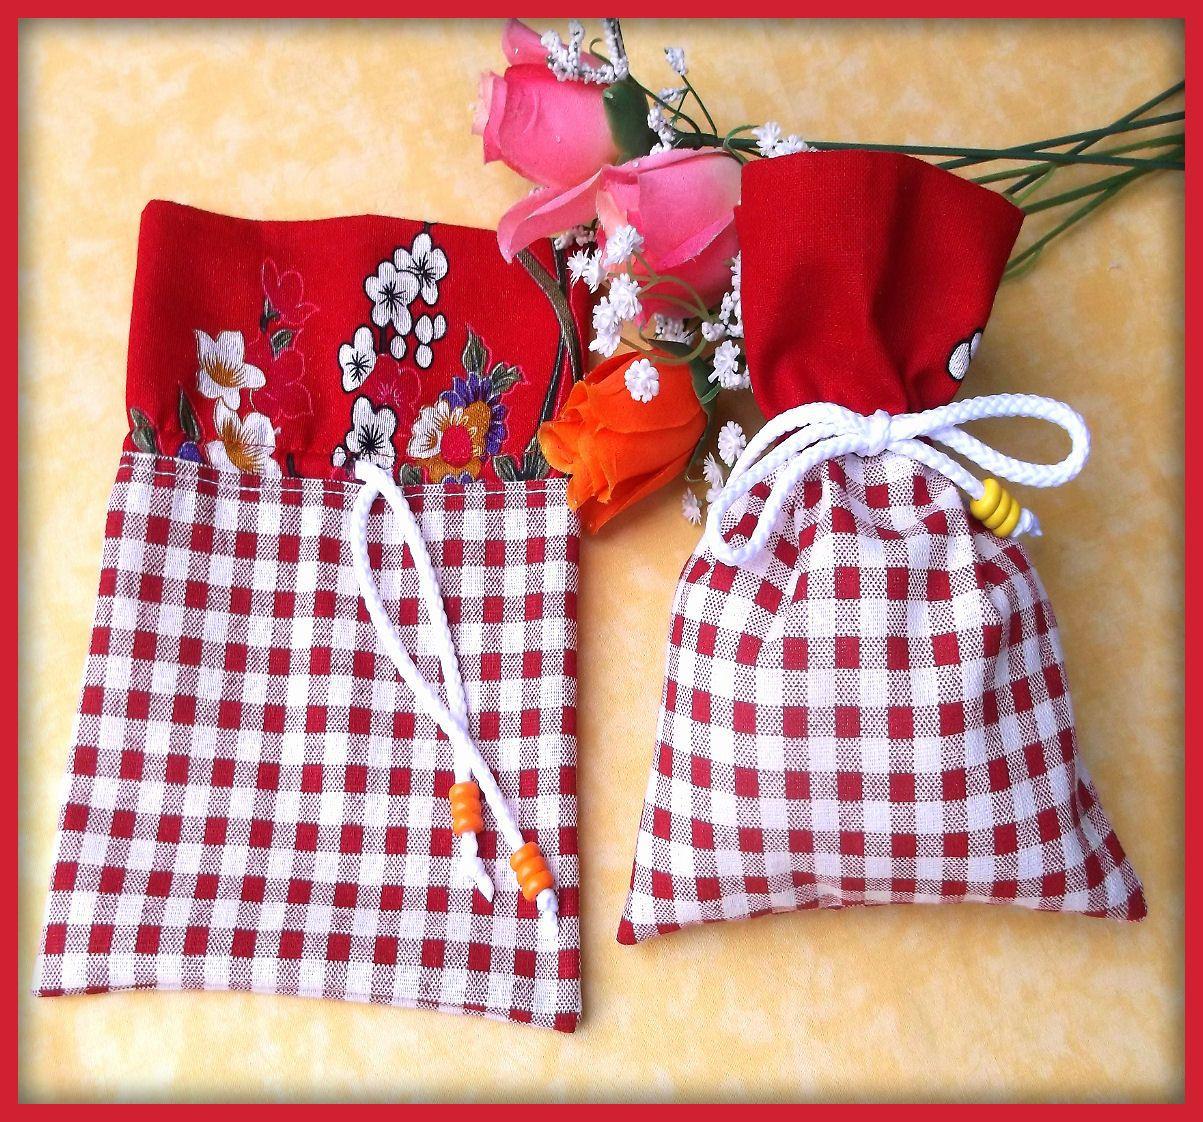 Pochons en tissu lin vichy rouge blanc : Autres sacs par orkan28